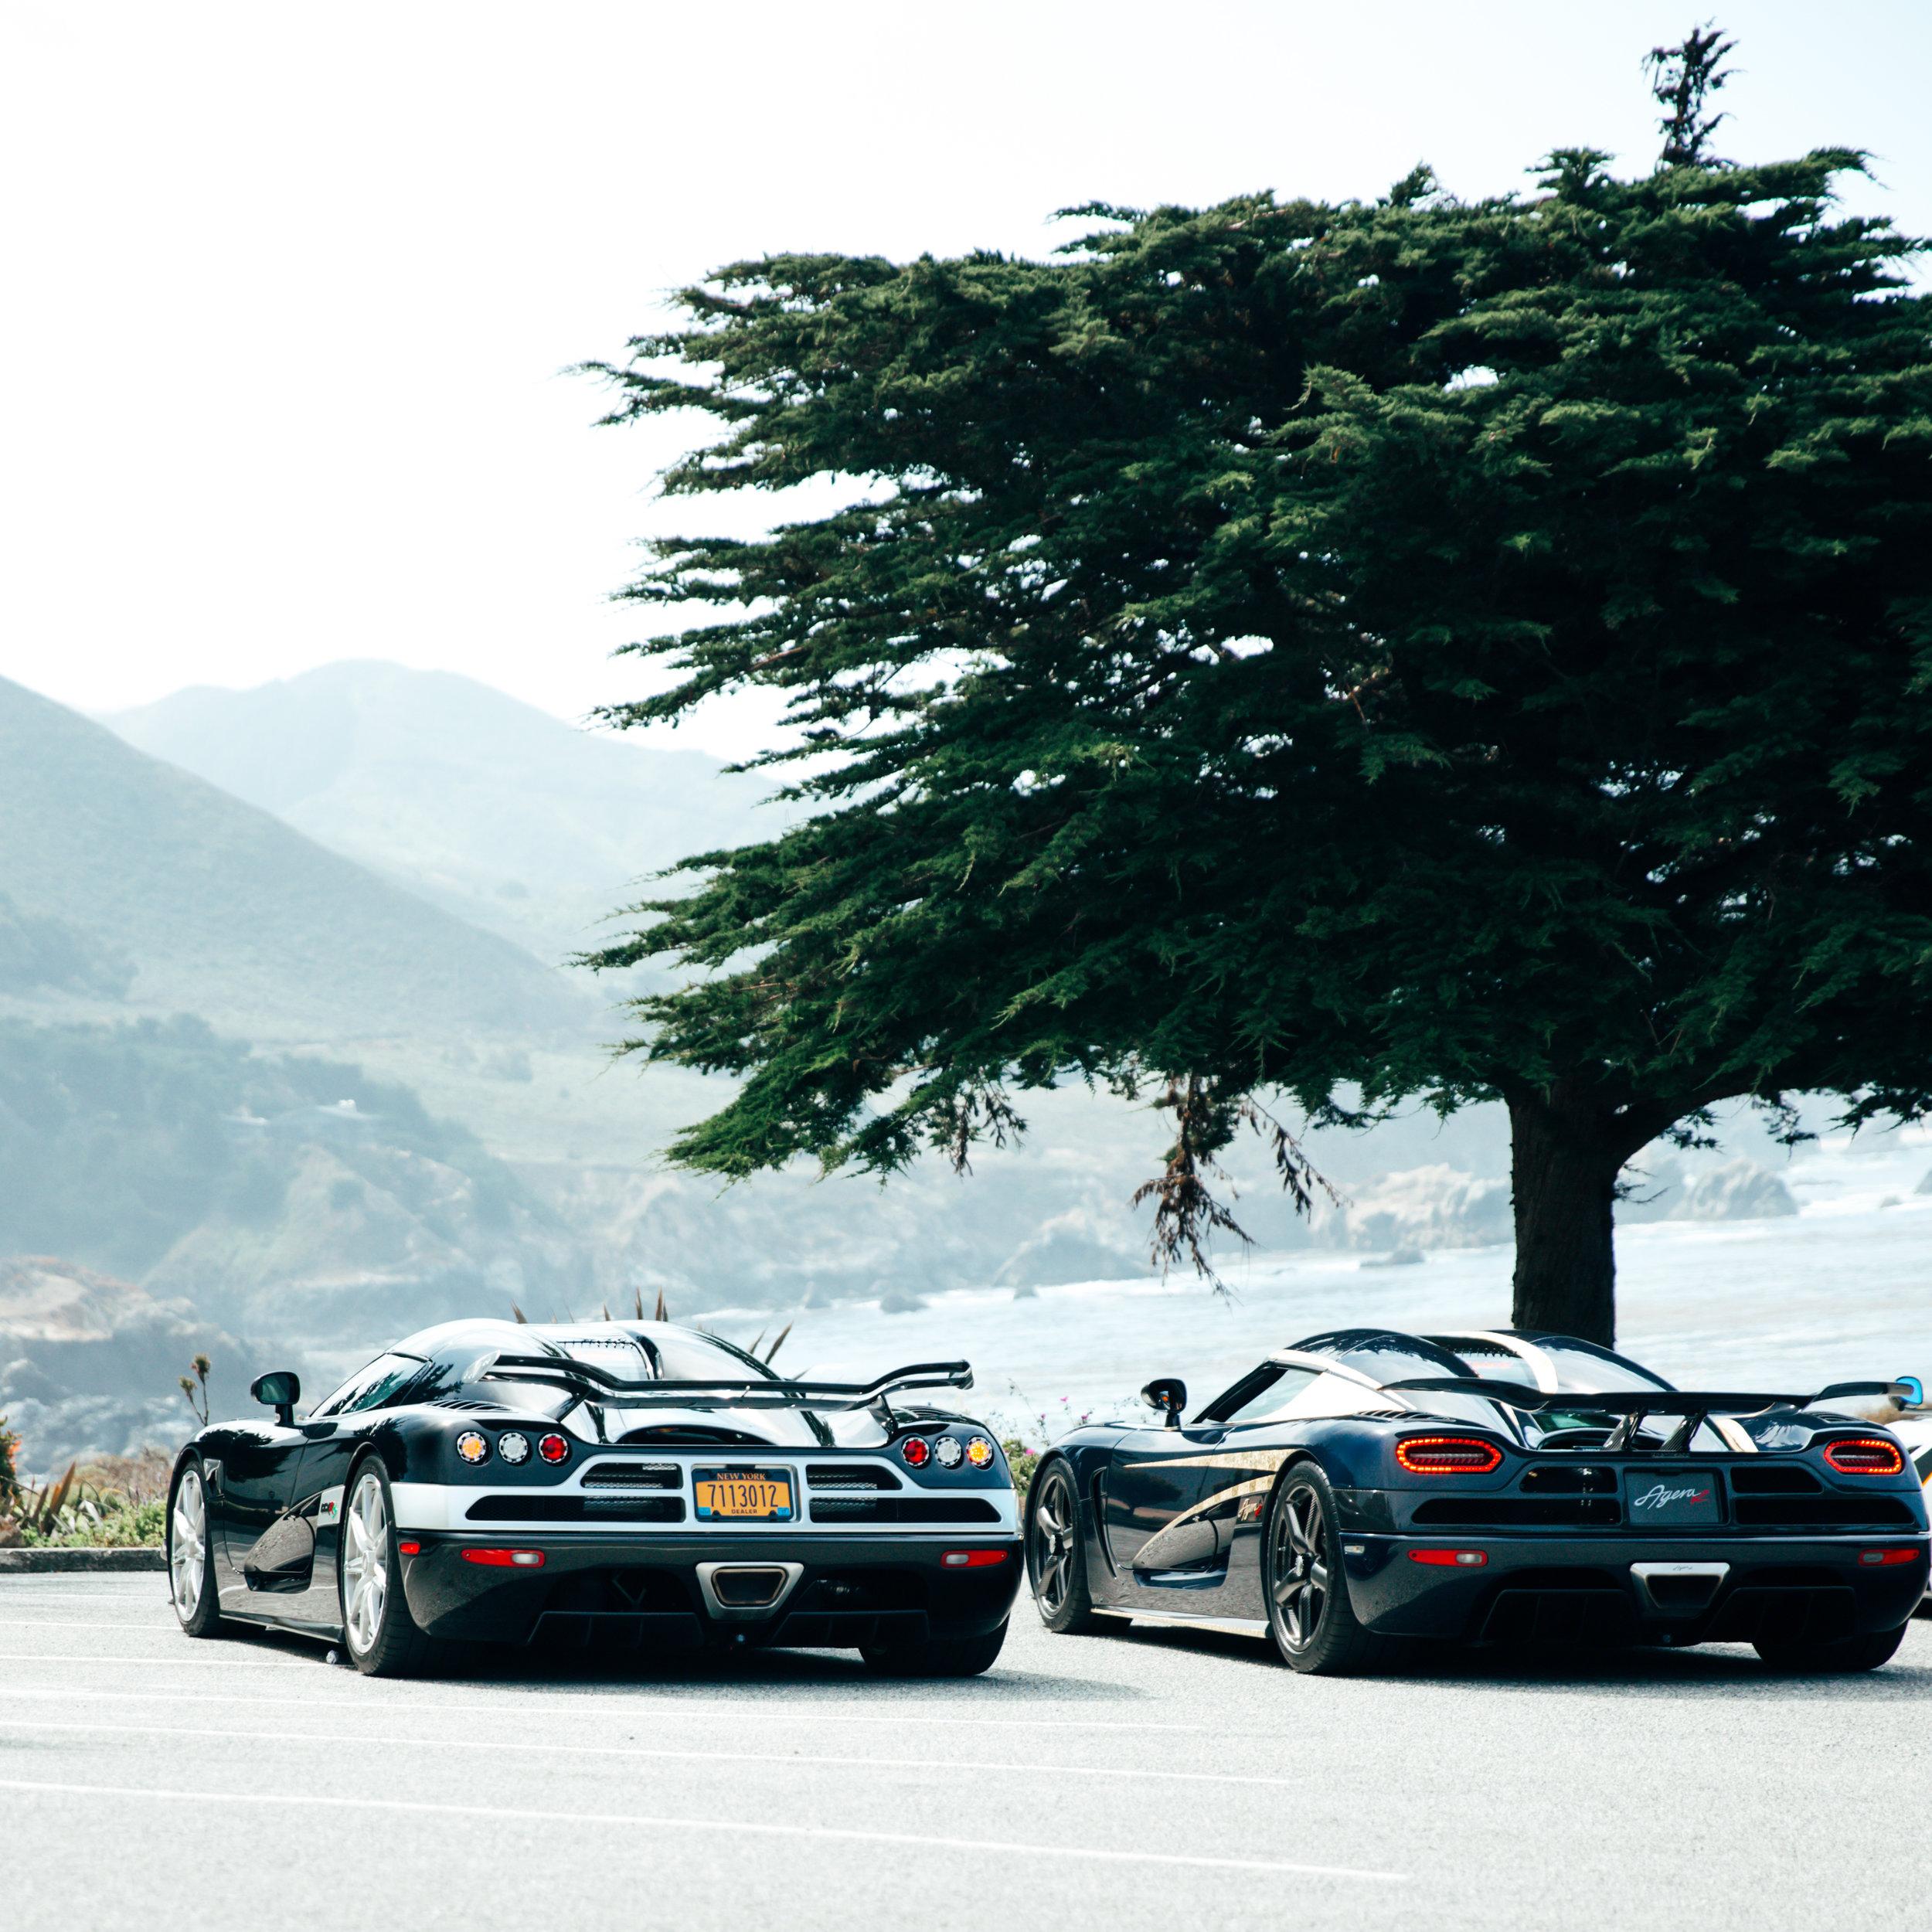 Stay_Driven_Monterey_Car_Week_Koenigsegg-49.jpg